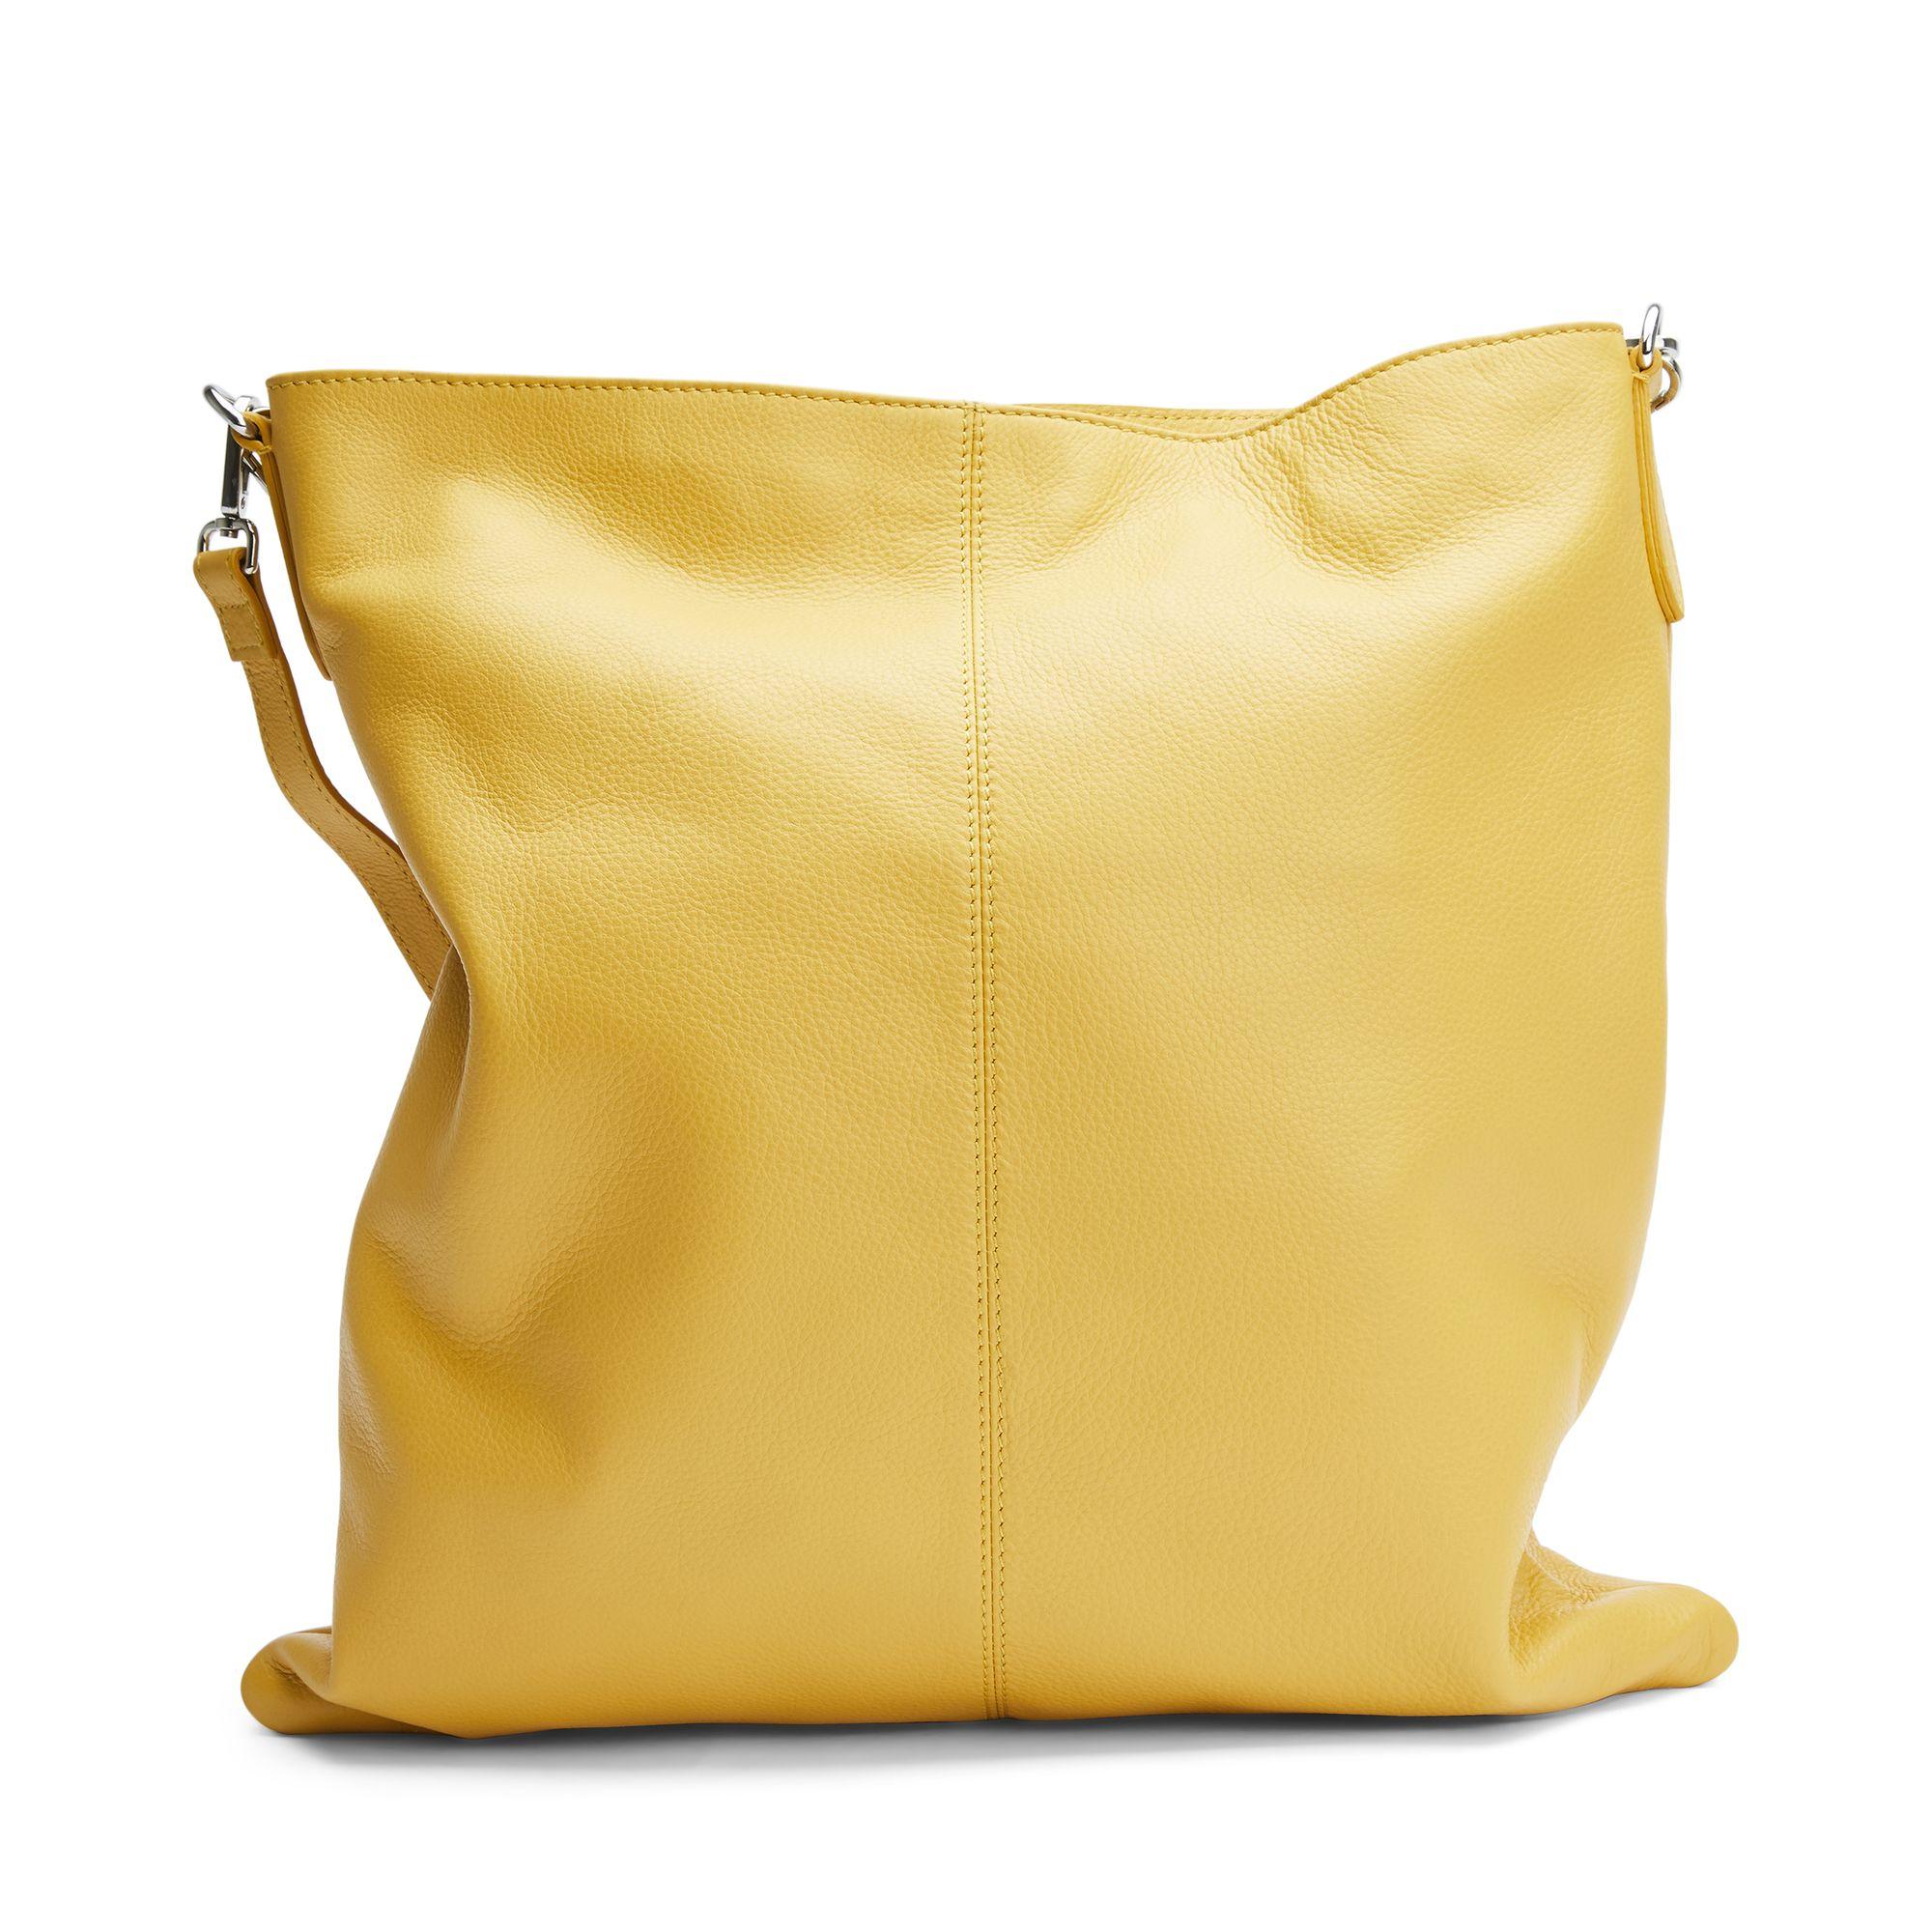 Rizzo Madonna Hobo handväska i skinn, Gul